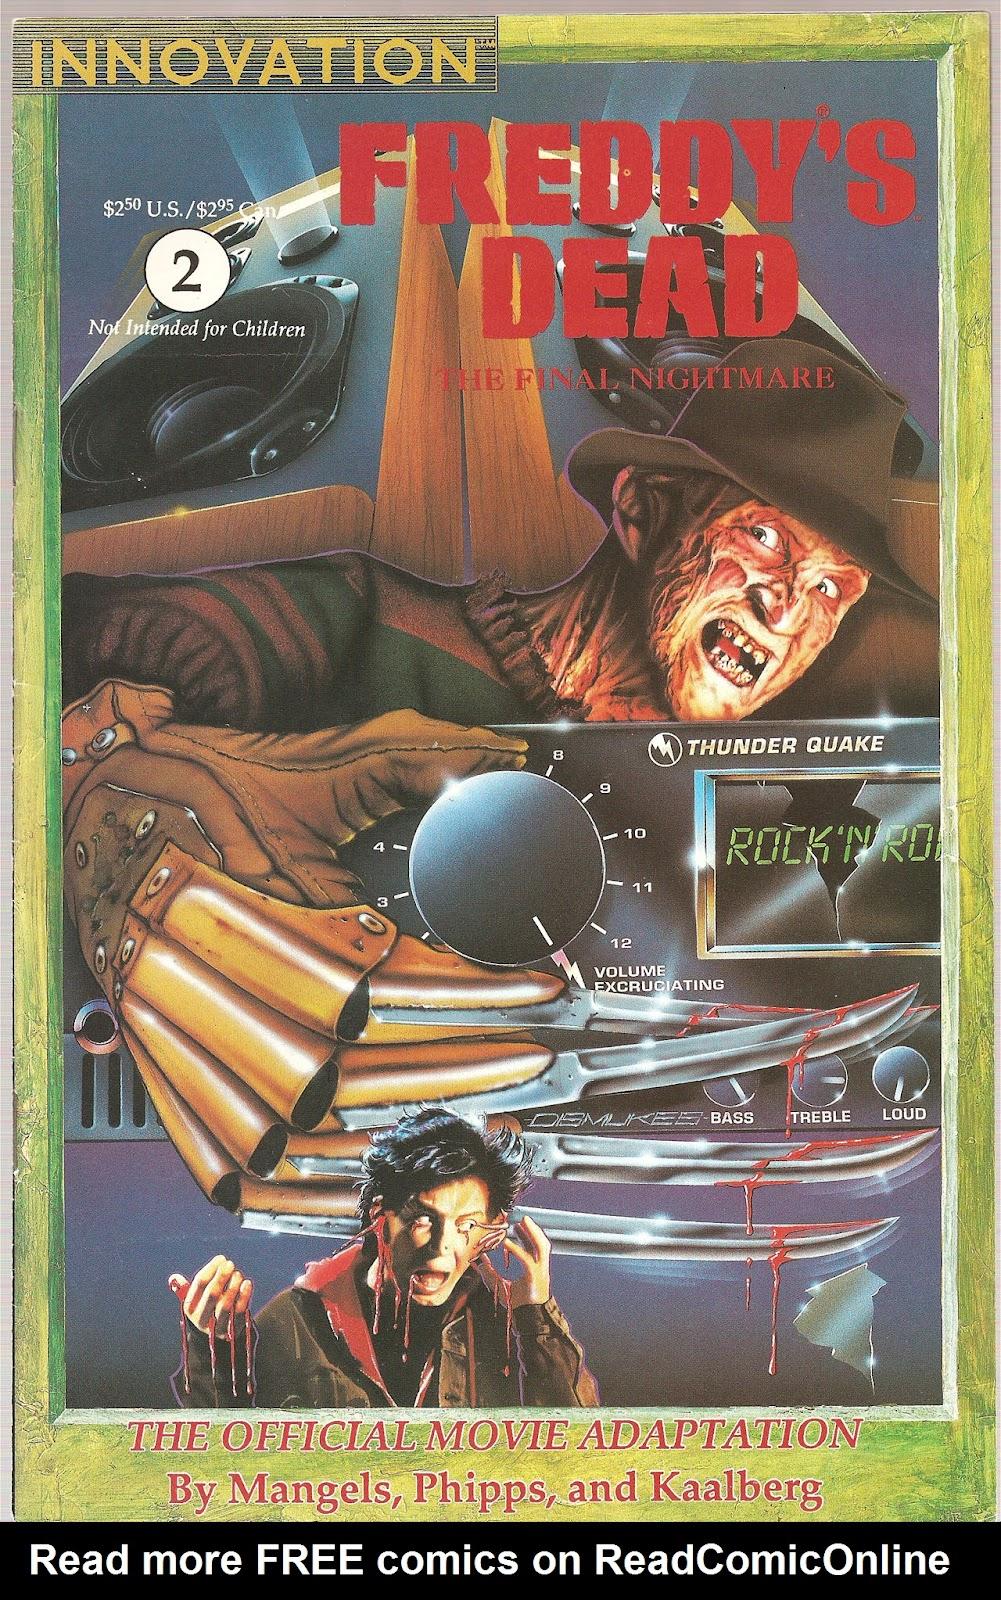 Read online Freddy's Dead: The Final Nightmare comic -  Issue #2 - 1